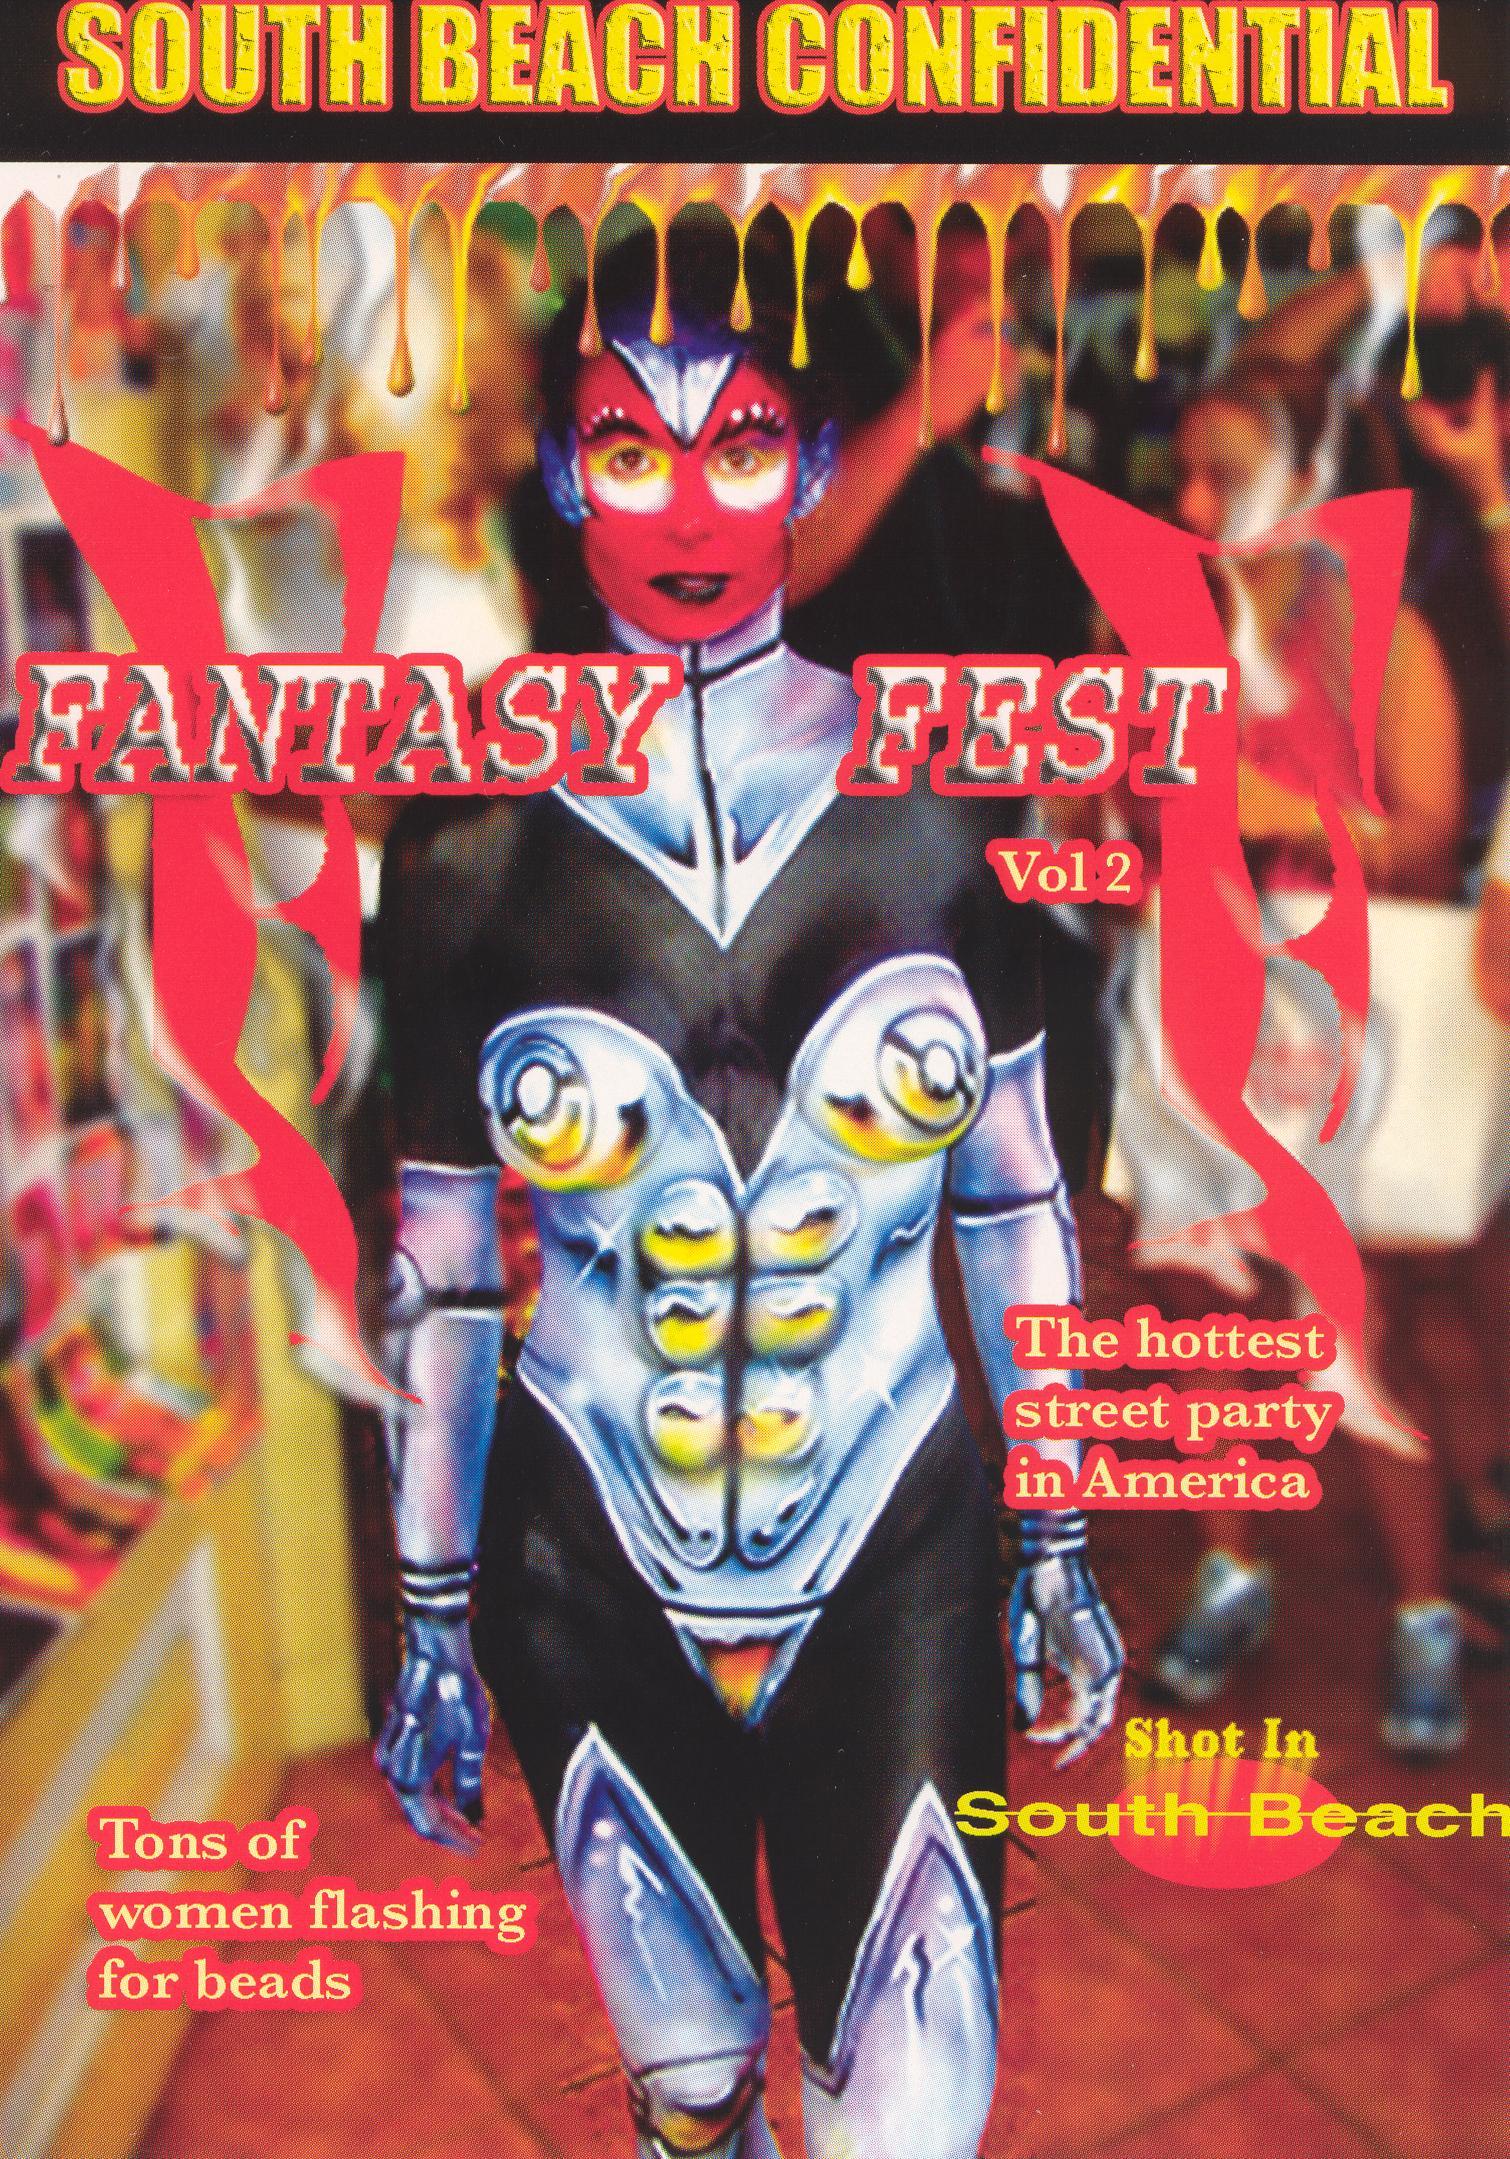 Fantasy Fest, Vol. 2: South Beach Confidential